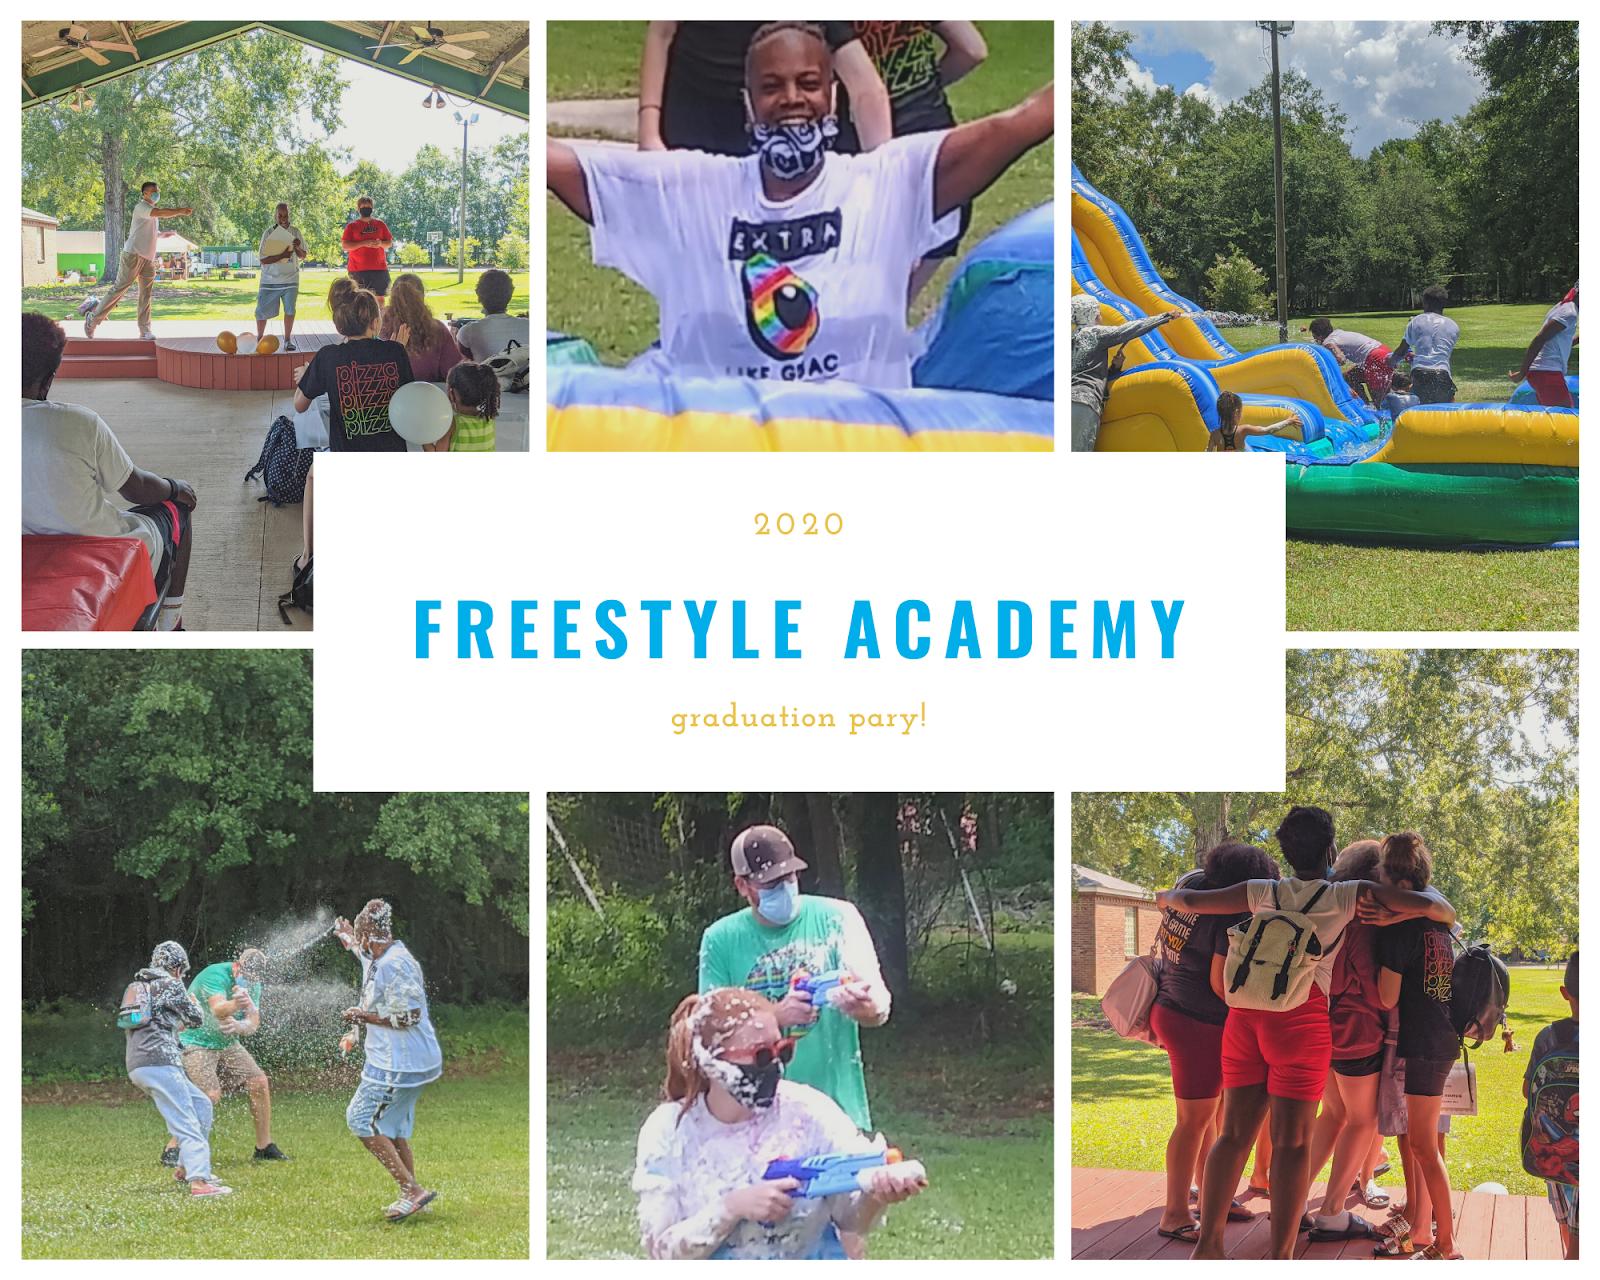 Freestyle Academy Provides Summer Fun Through Reading